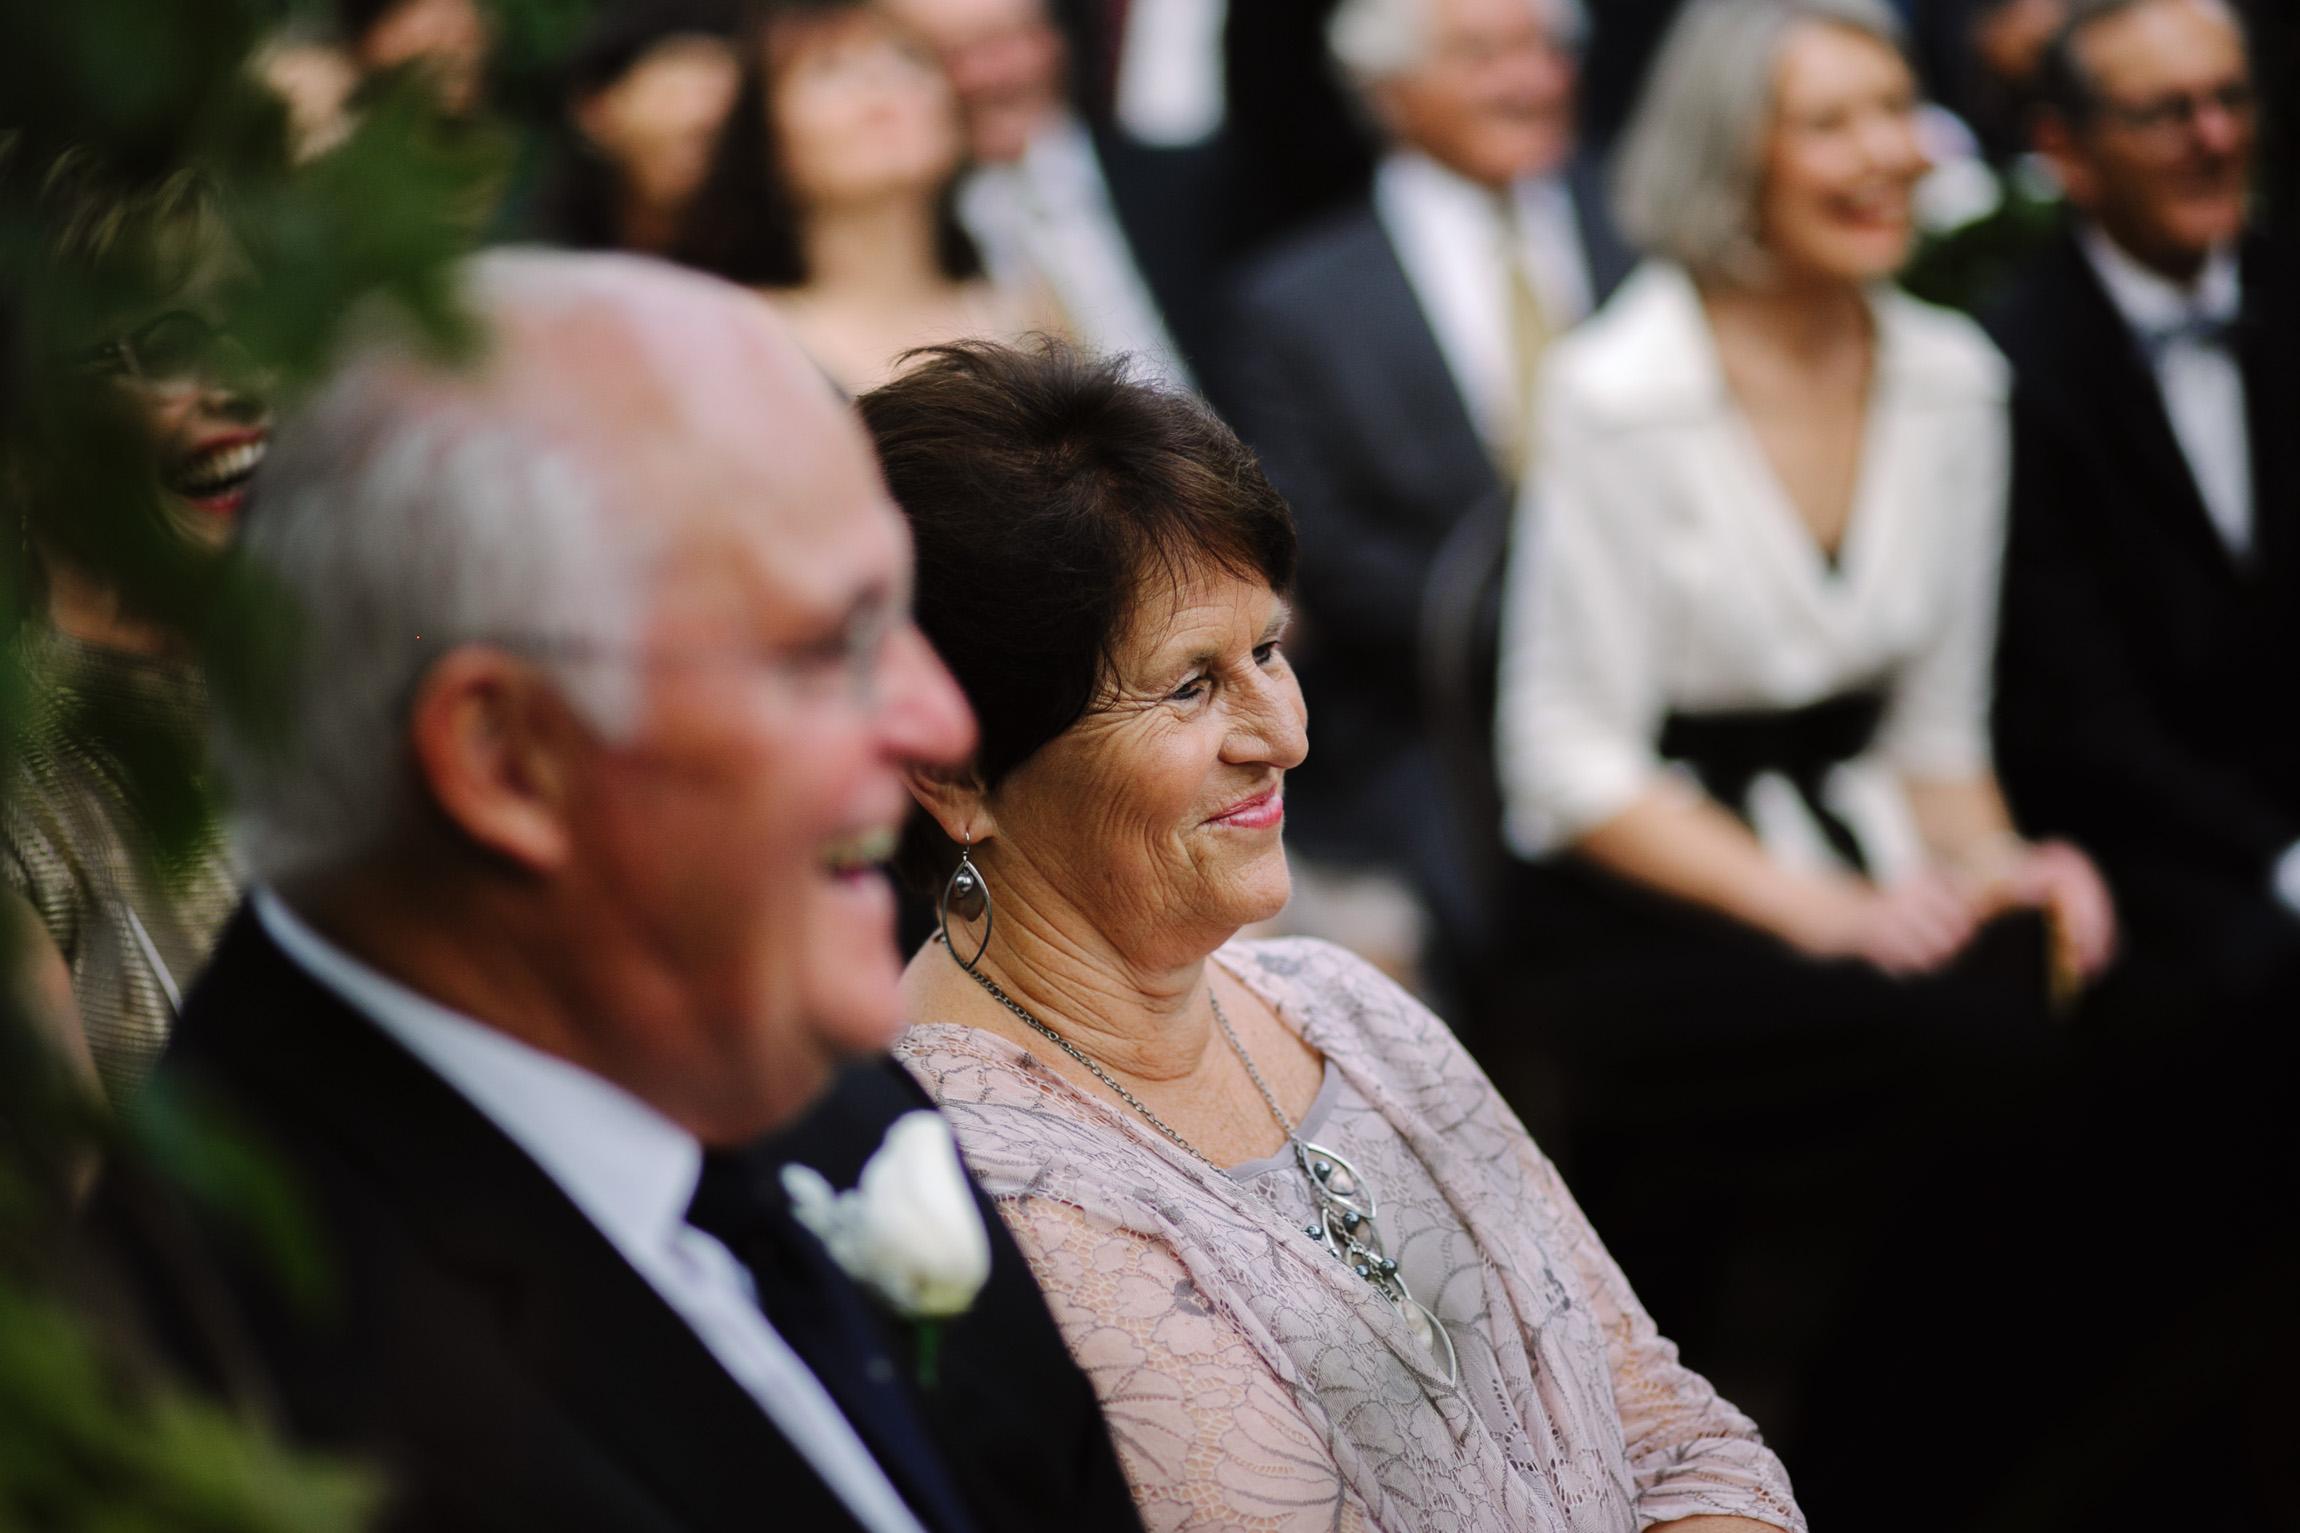 180223_justinaaron_wedding_charlotte_david_h-116.jpg